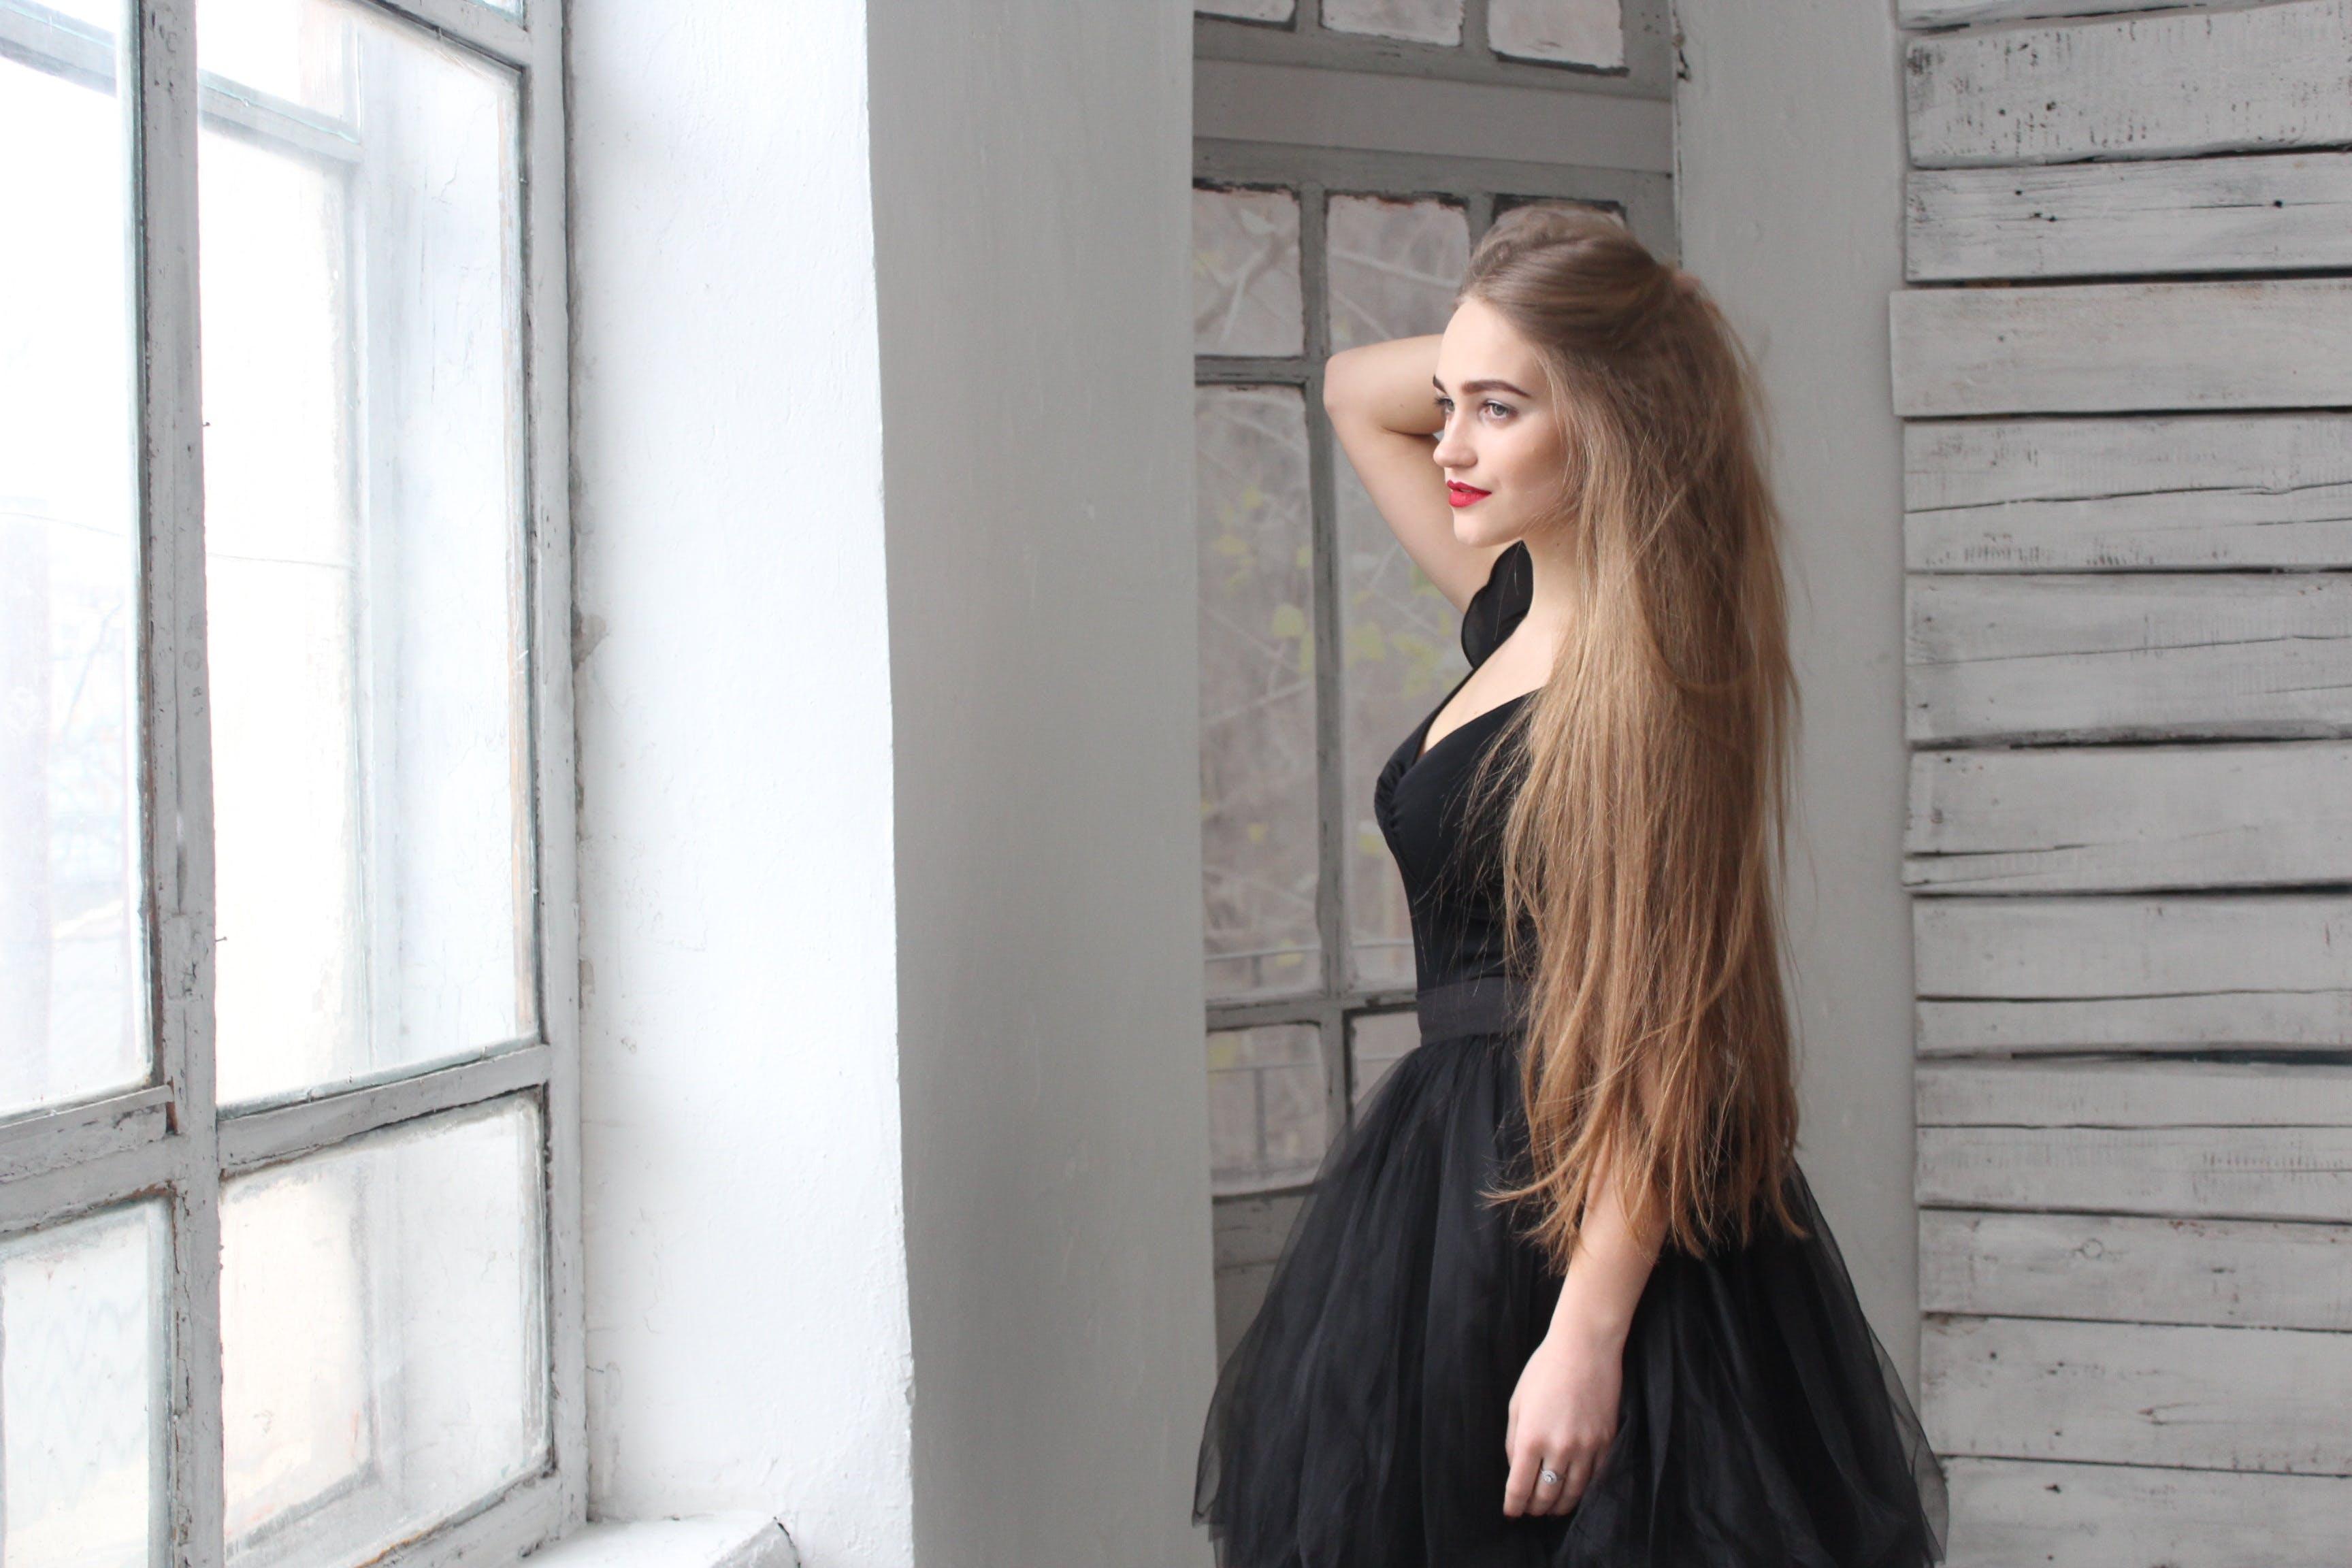 Free stock photo of girl, thoughtfulness, white hall